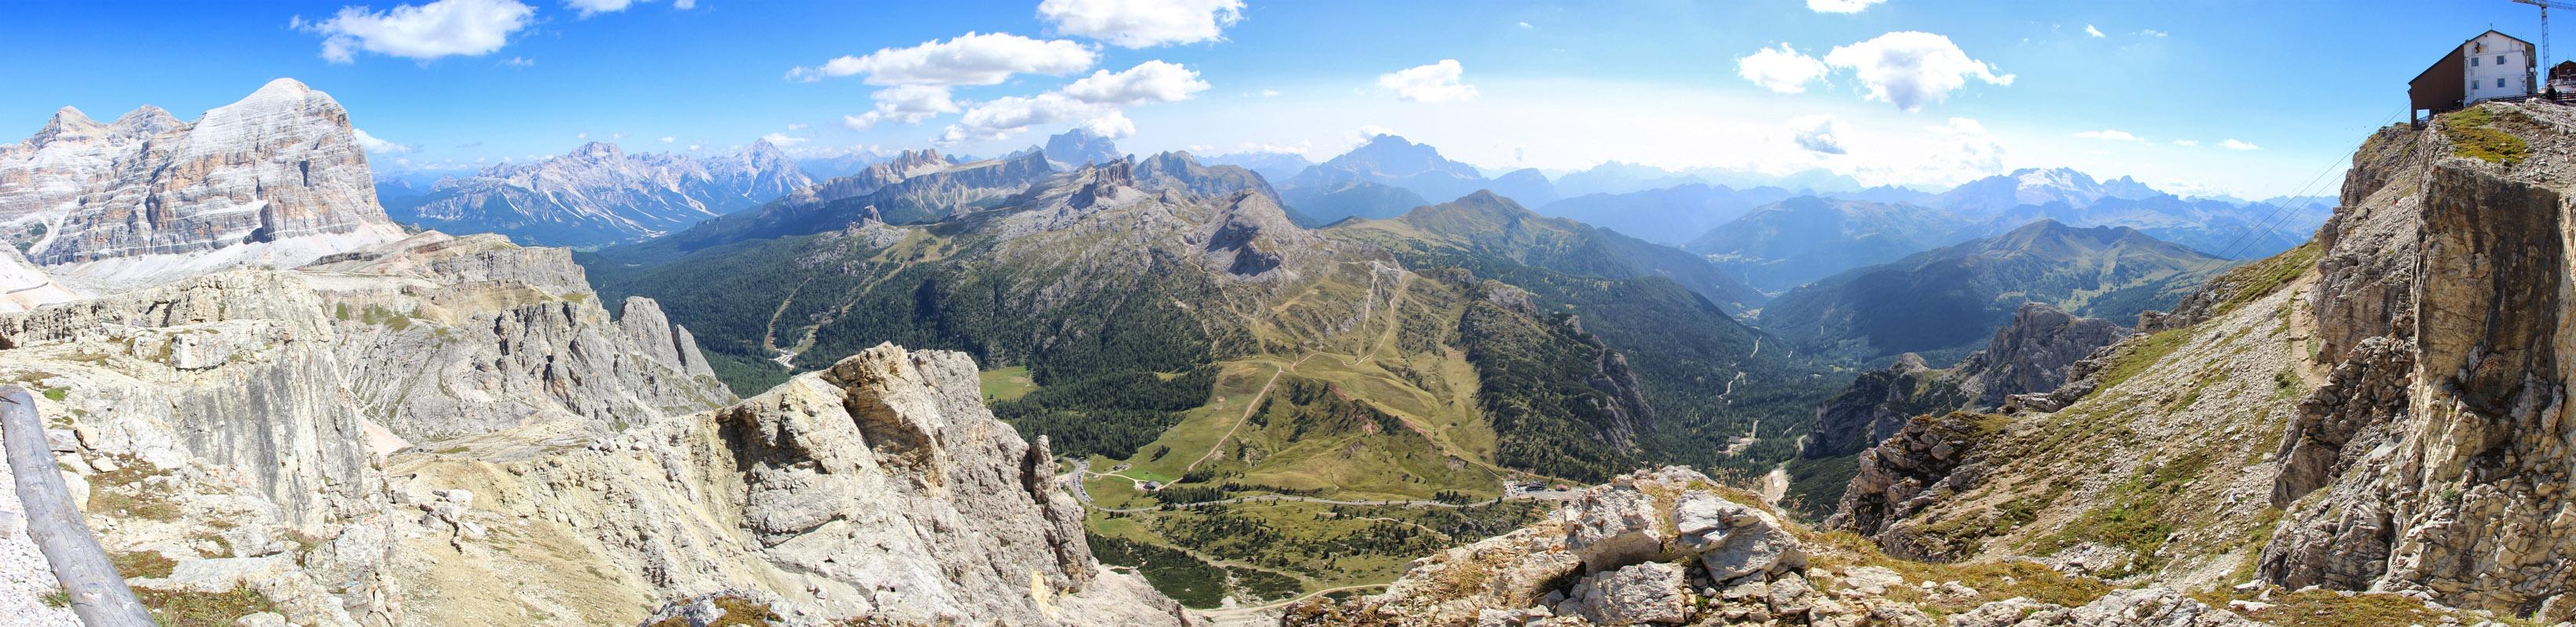 Panoráma Tofana di Rozes, Punta Sorapiss, Antelao, Monte Pelmo, Marmolada a Rifugio Lagazuoi, Dolomity